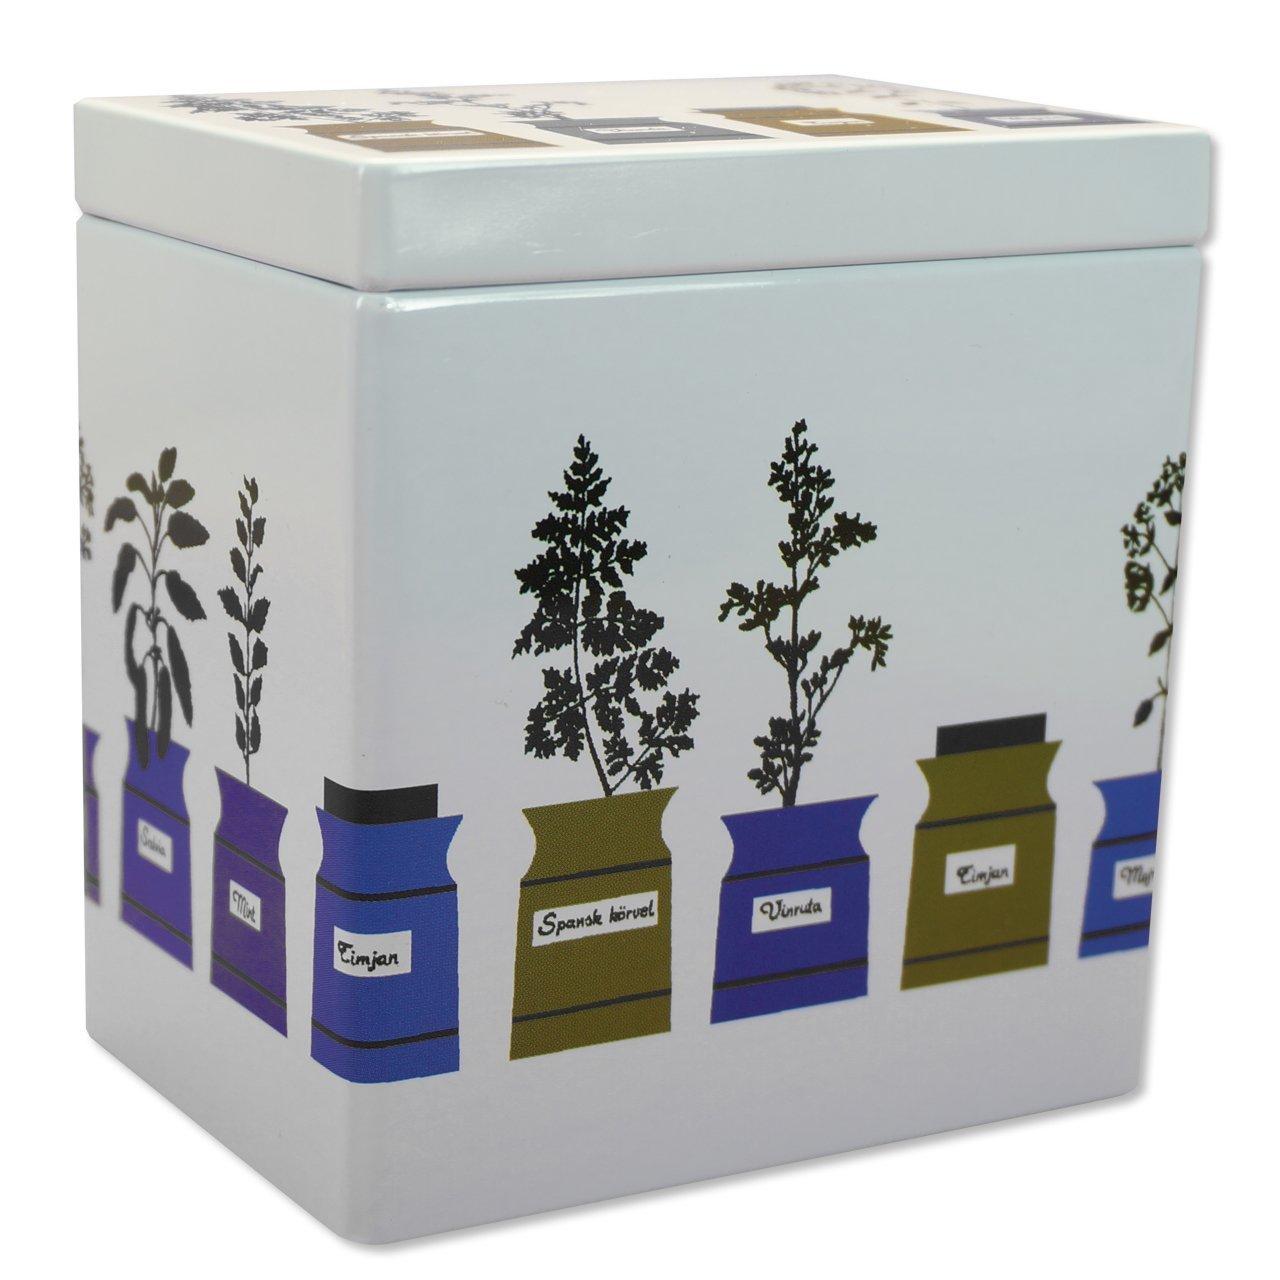 コーヒー・紅茶缶S Persons kryddskåp 10.2×7.3×11.0cm